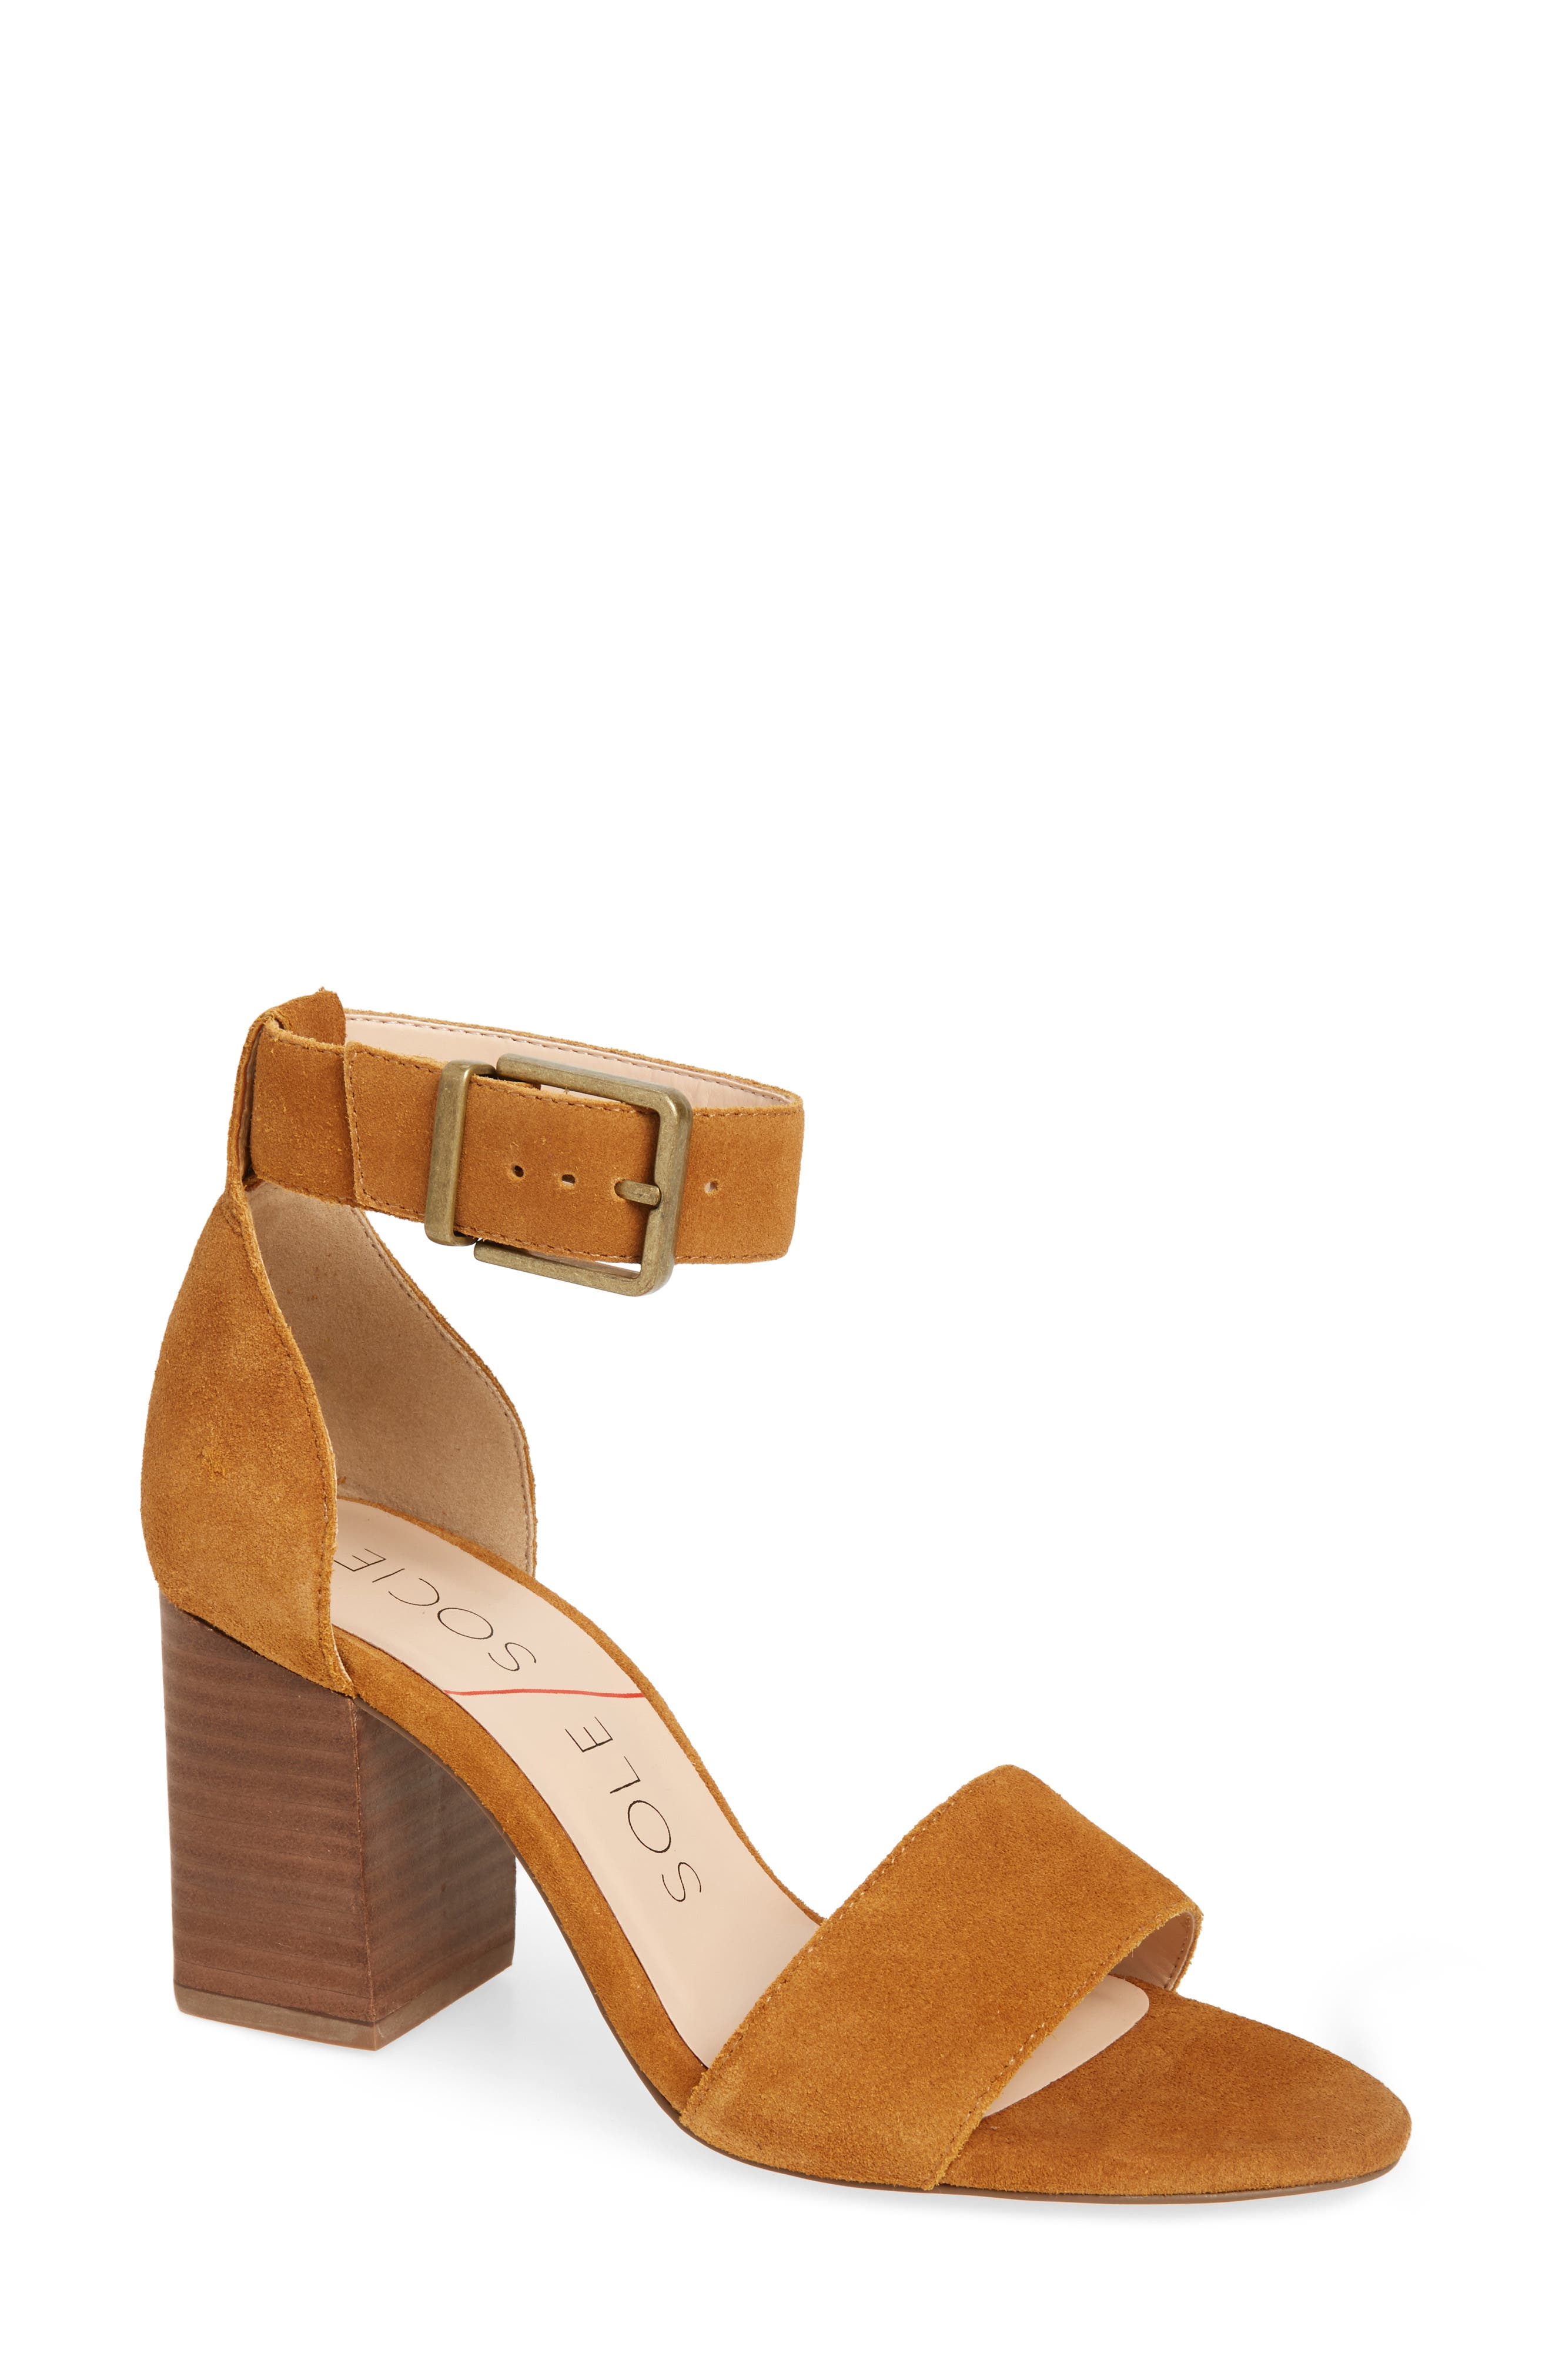 Alternate Image 1 Selected - Sole Society Montana Sandal (Women)